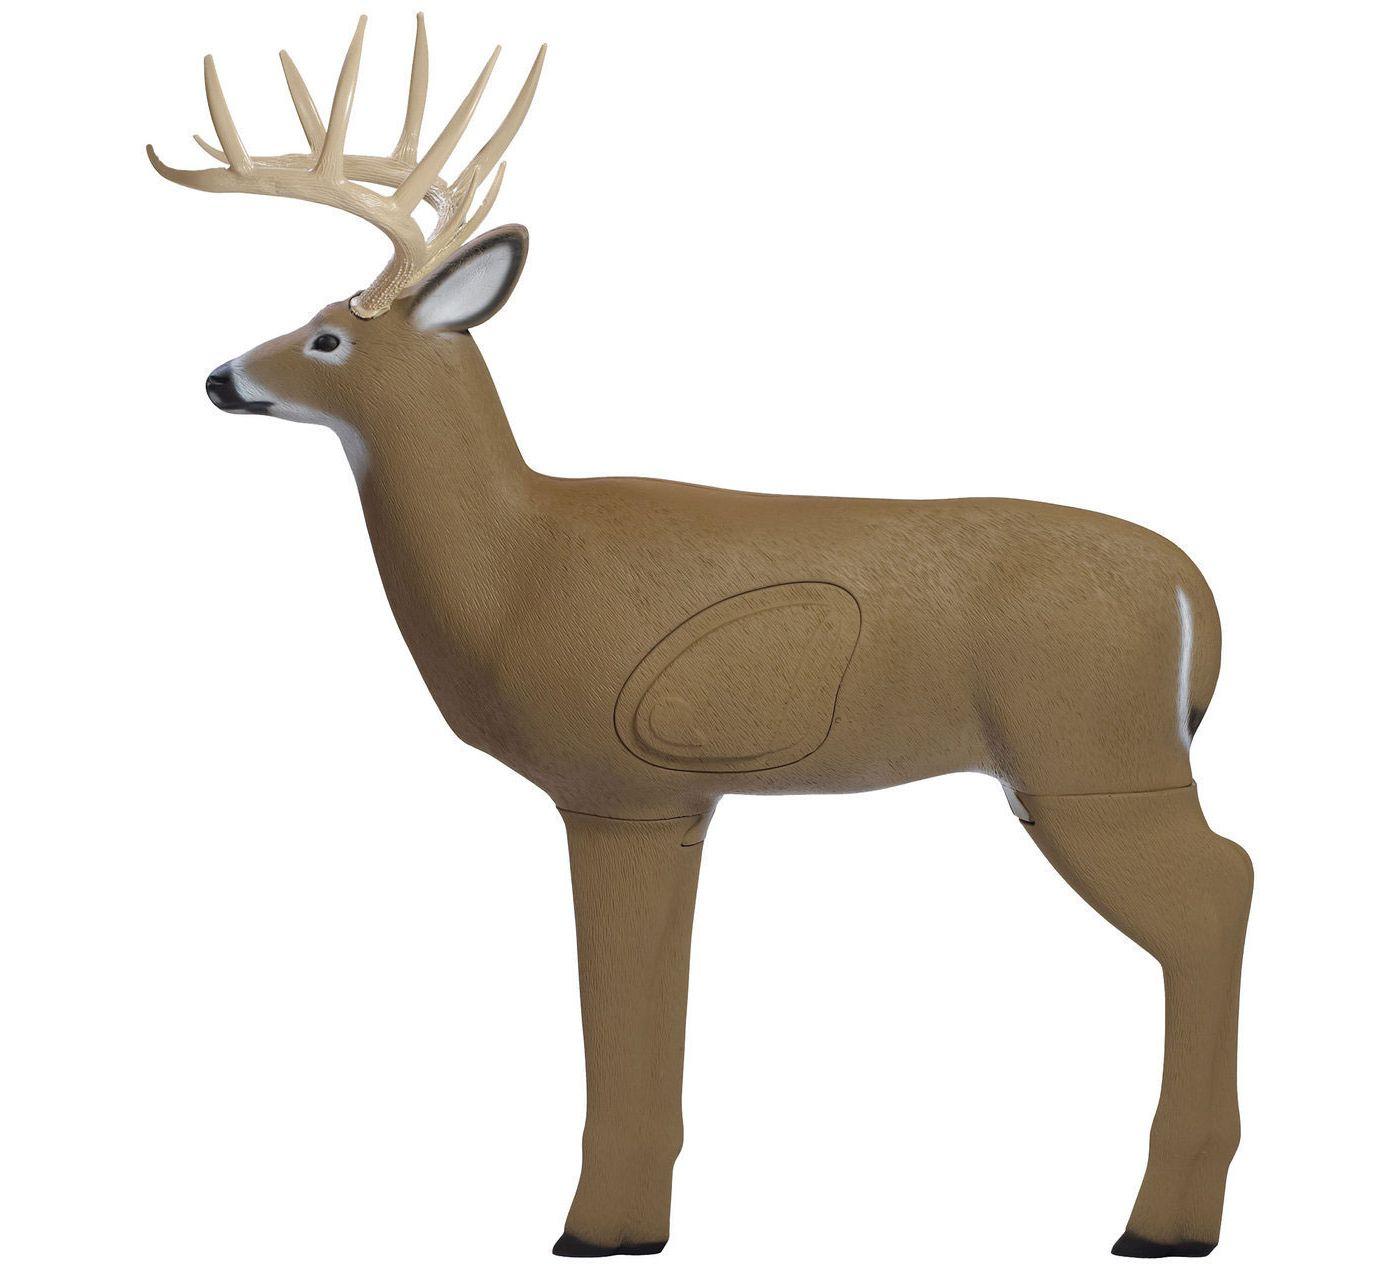 GlenDel Shooter Buck 3D Archery Target